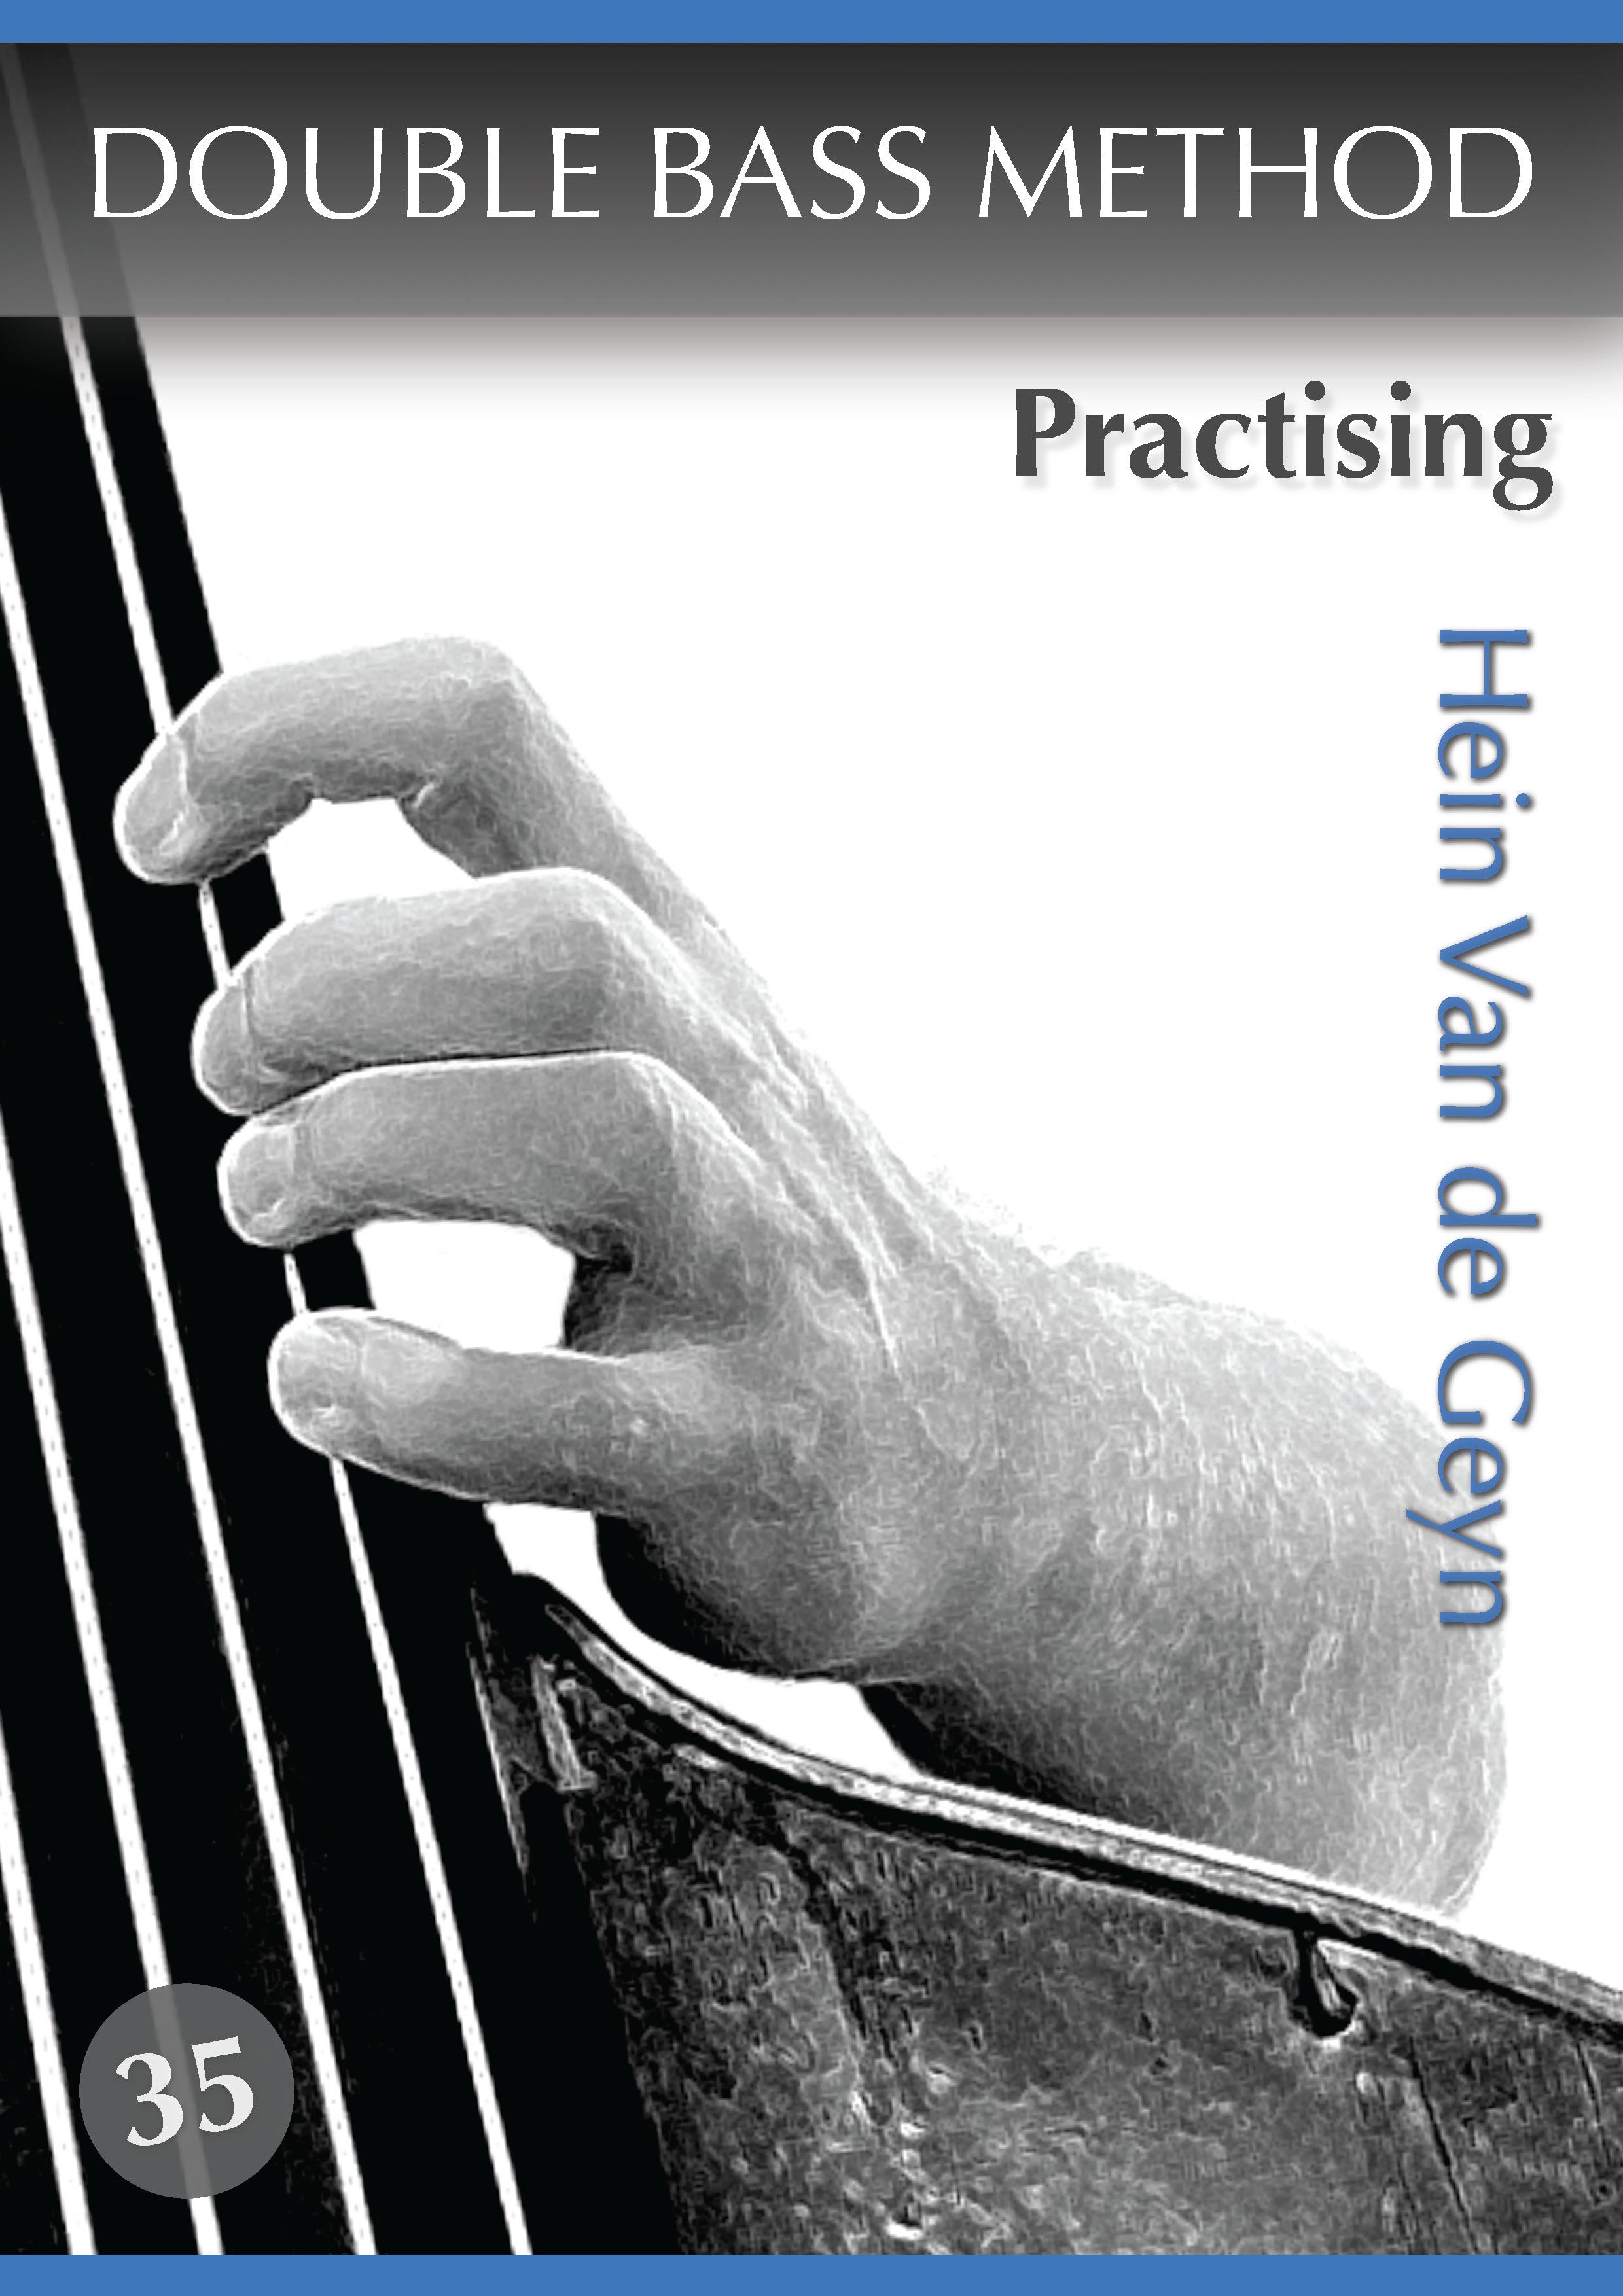 Practising an instrument